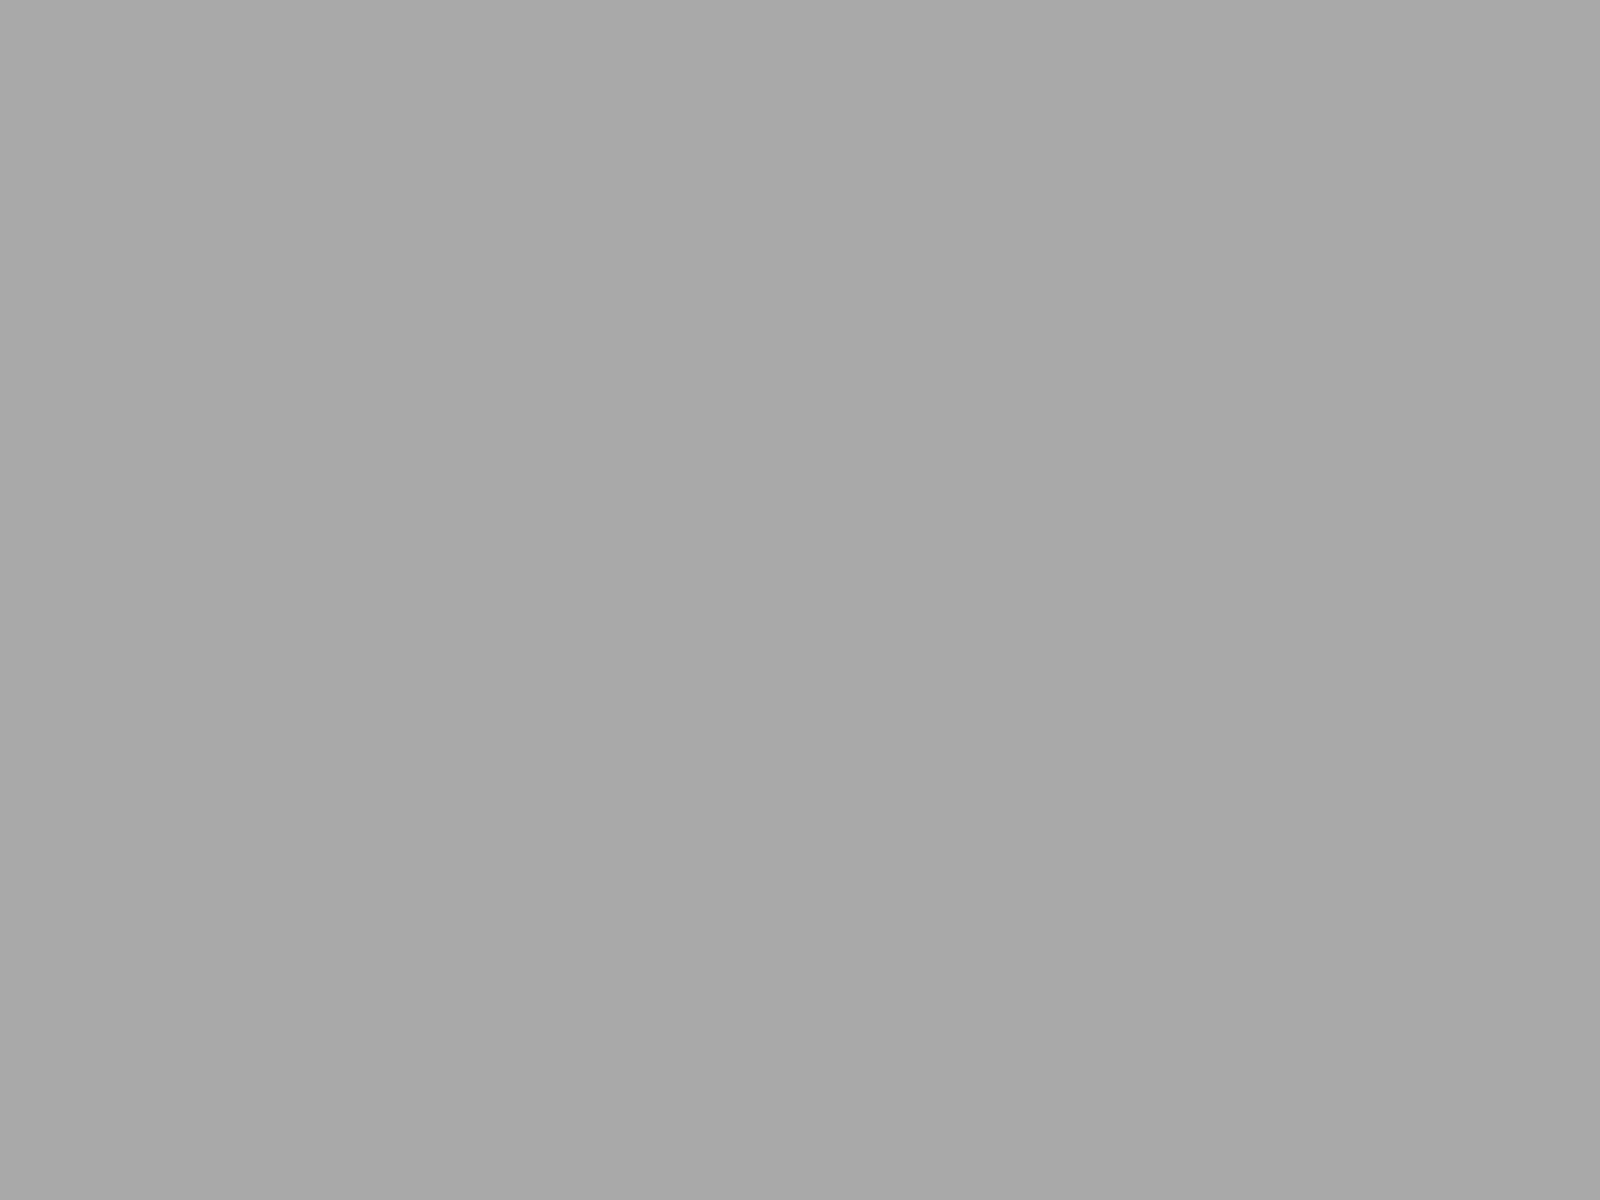 1600x1200 Dark Gray Solid Color Background